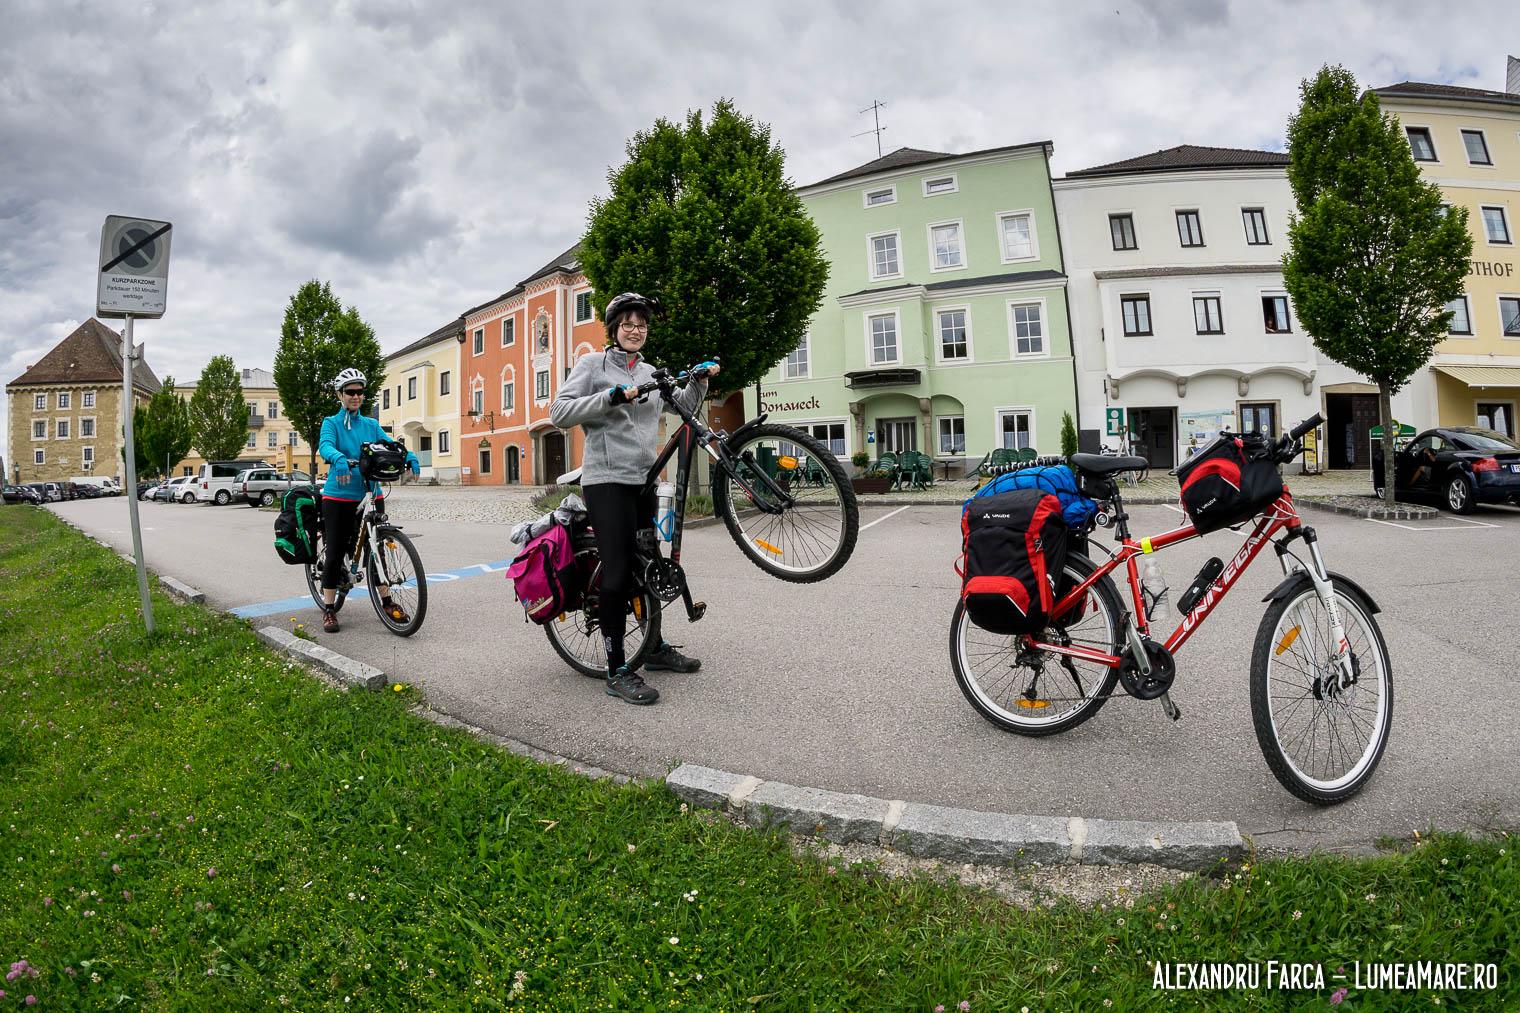 Cu bicicletele prin Mauthausen